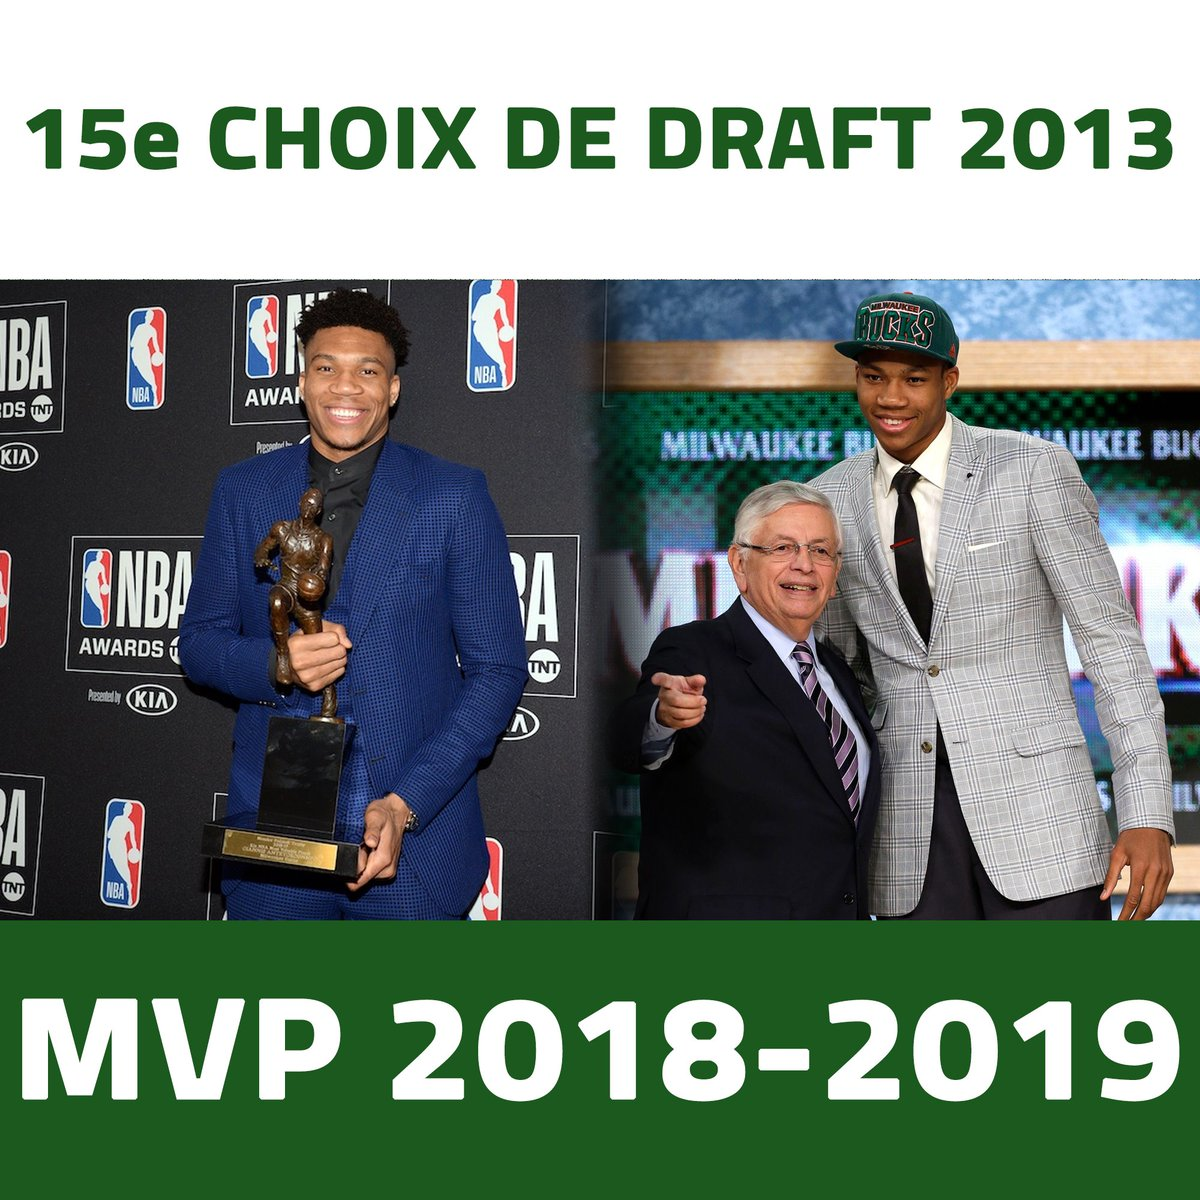 Monsieur #Antetokounmpo 🏀 #NBAAwards